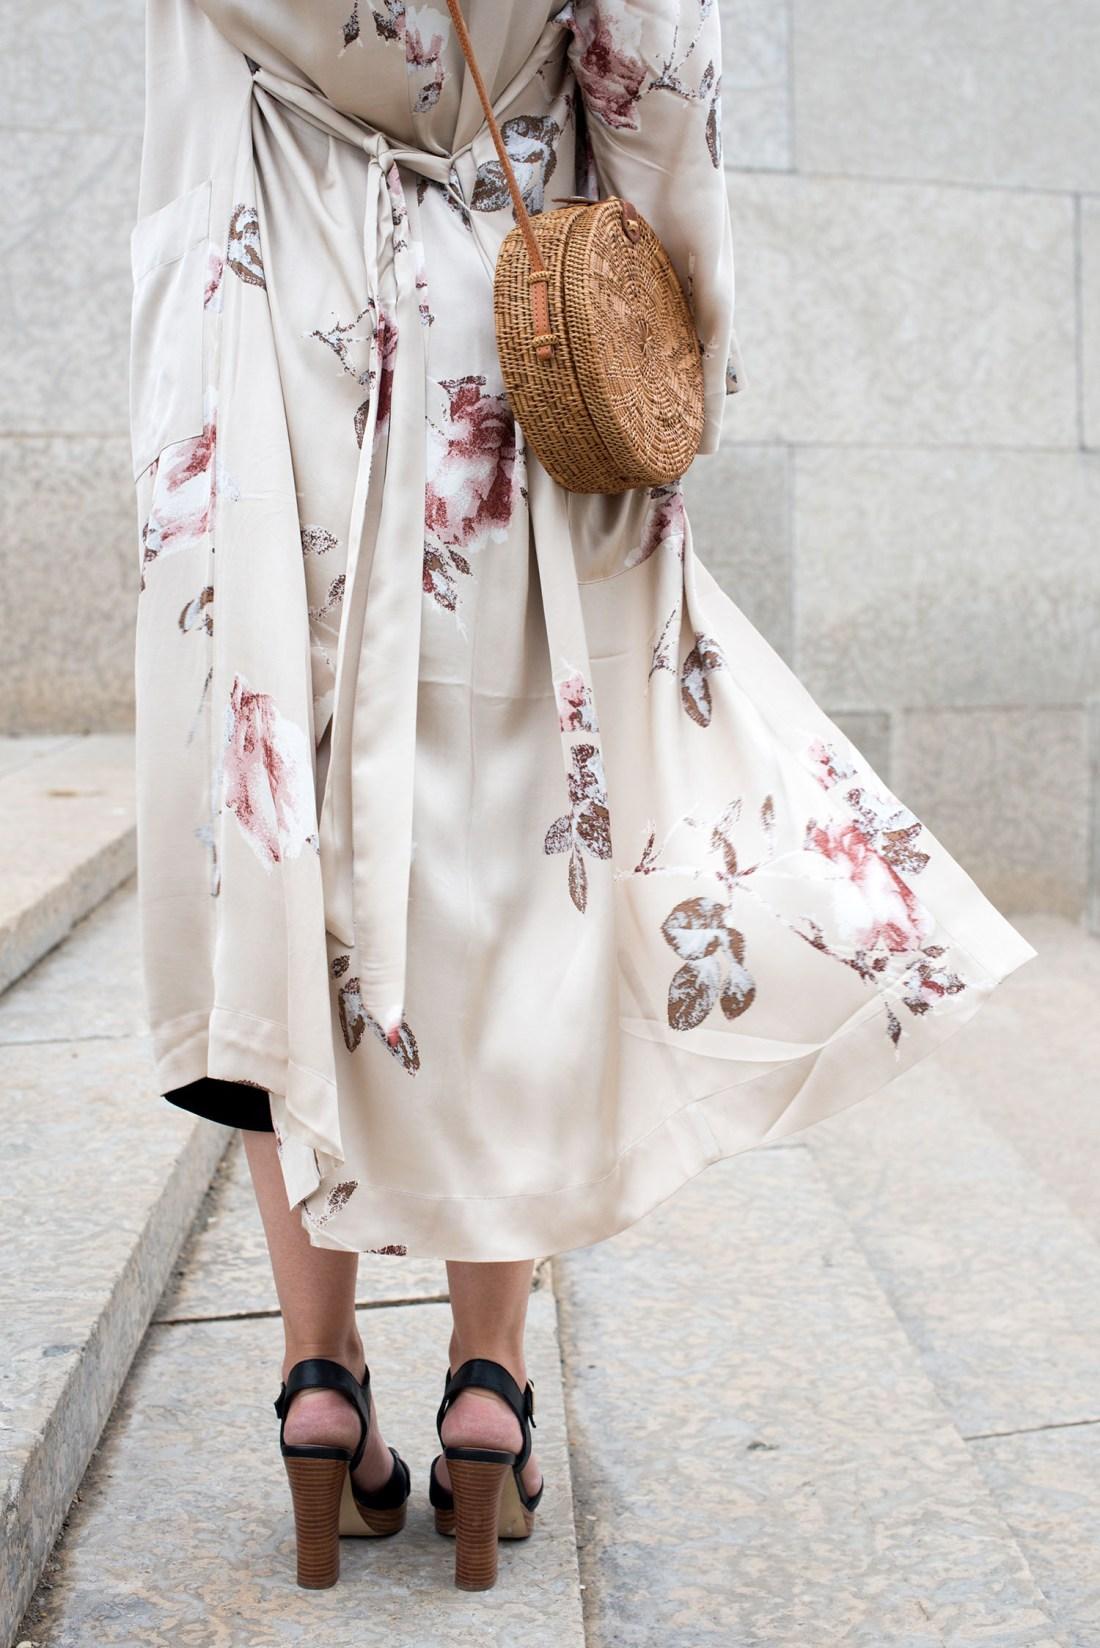 Outfit details on top Winnipeg fashion blogger Cee Fardoe of Coco & Vera including an Aritzia silk kimono and Le Chateau platform sandals